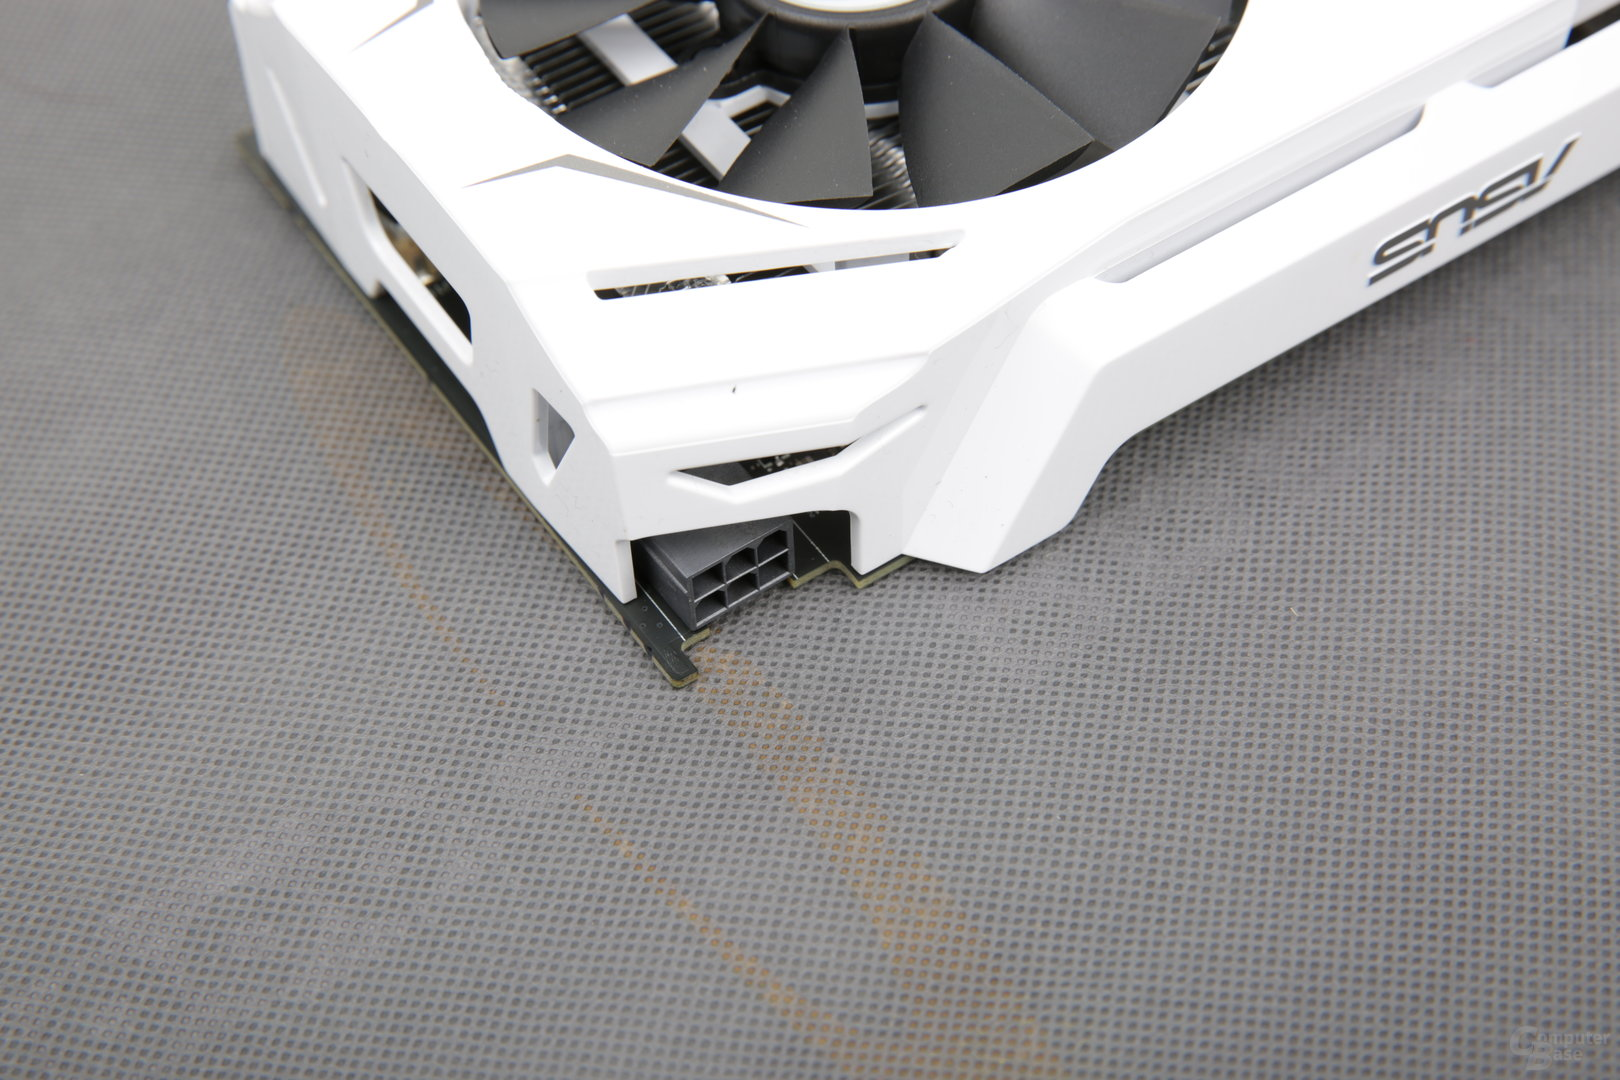 Asus GeForce GTX 1060 Dual OC – ein Mal 6 Pin